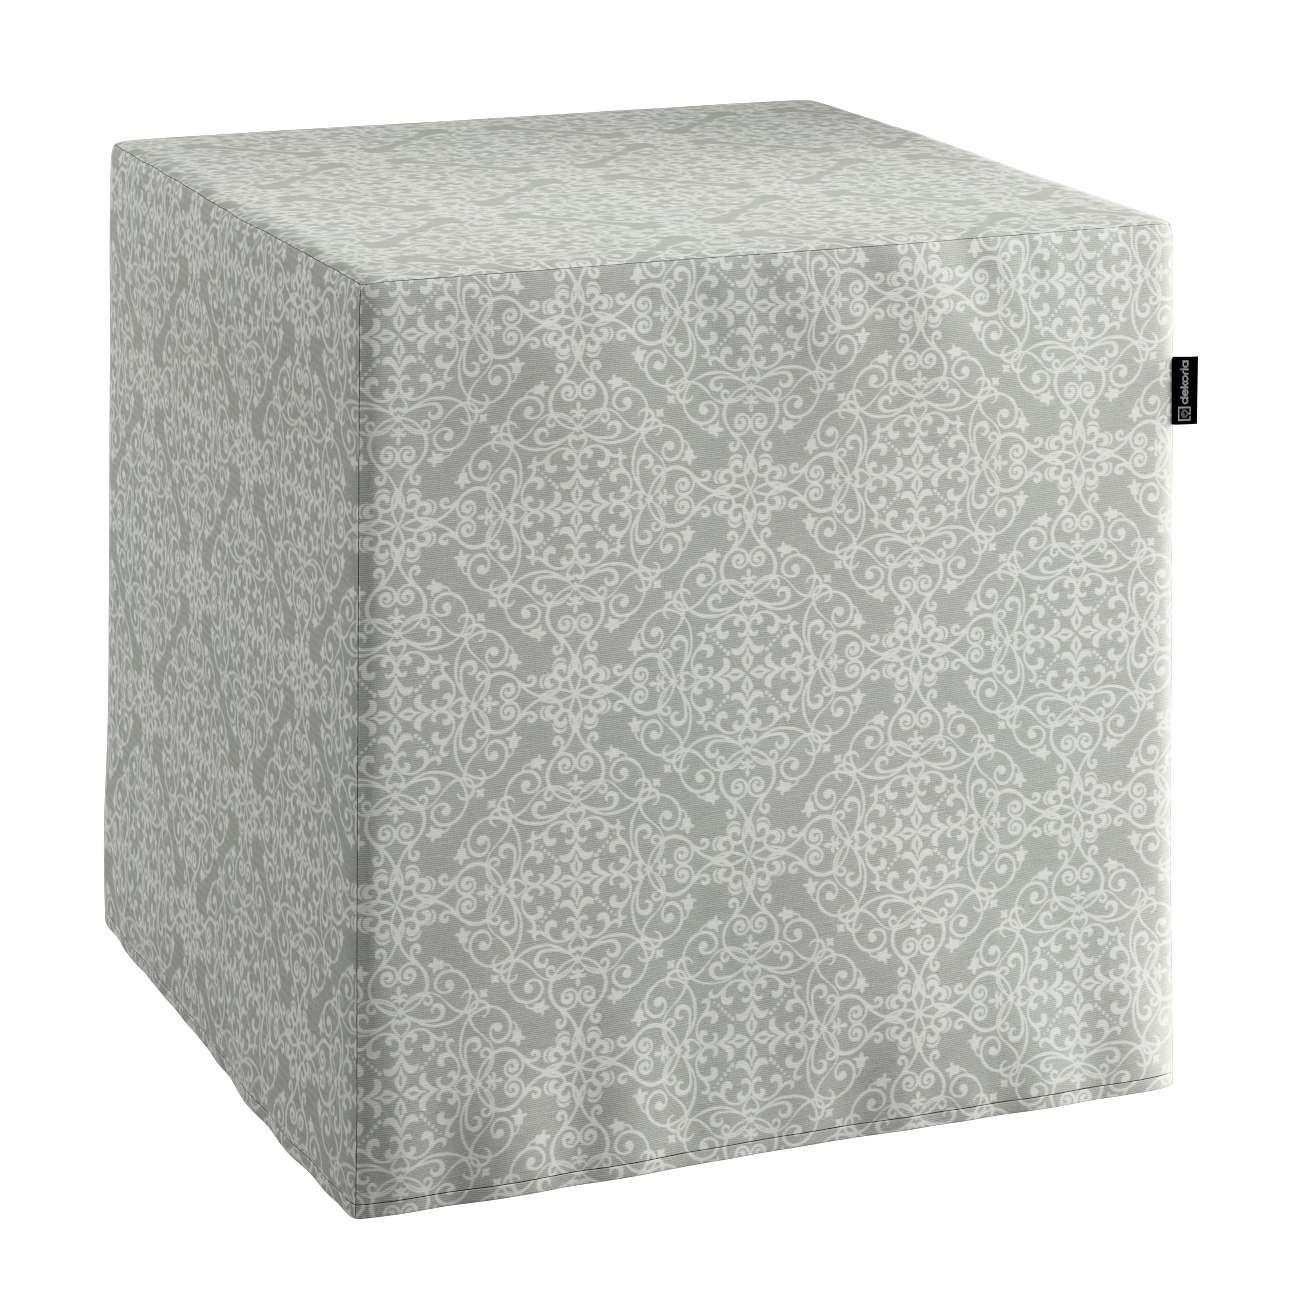 Sedák Cube - kostka pevná 40x40x40 v kolekci Flowers, látka: 140-38